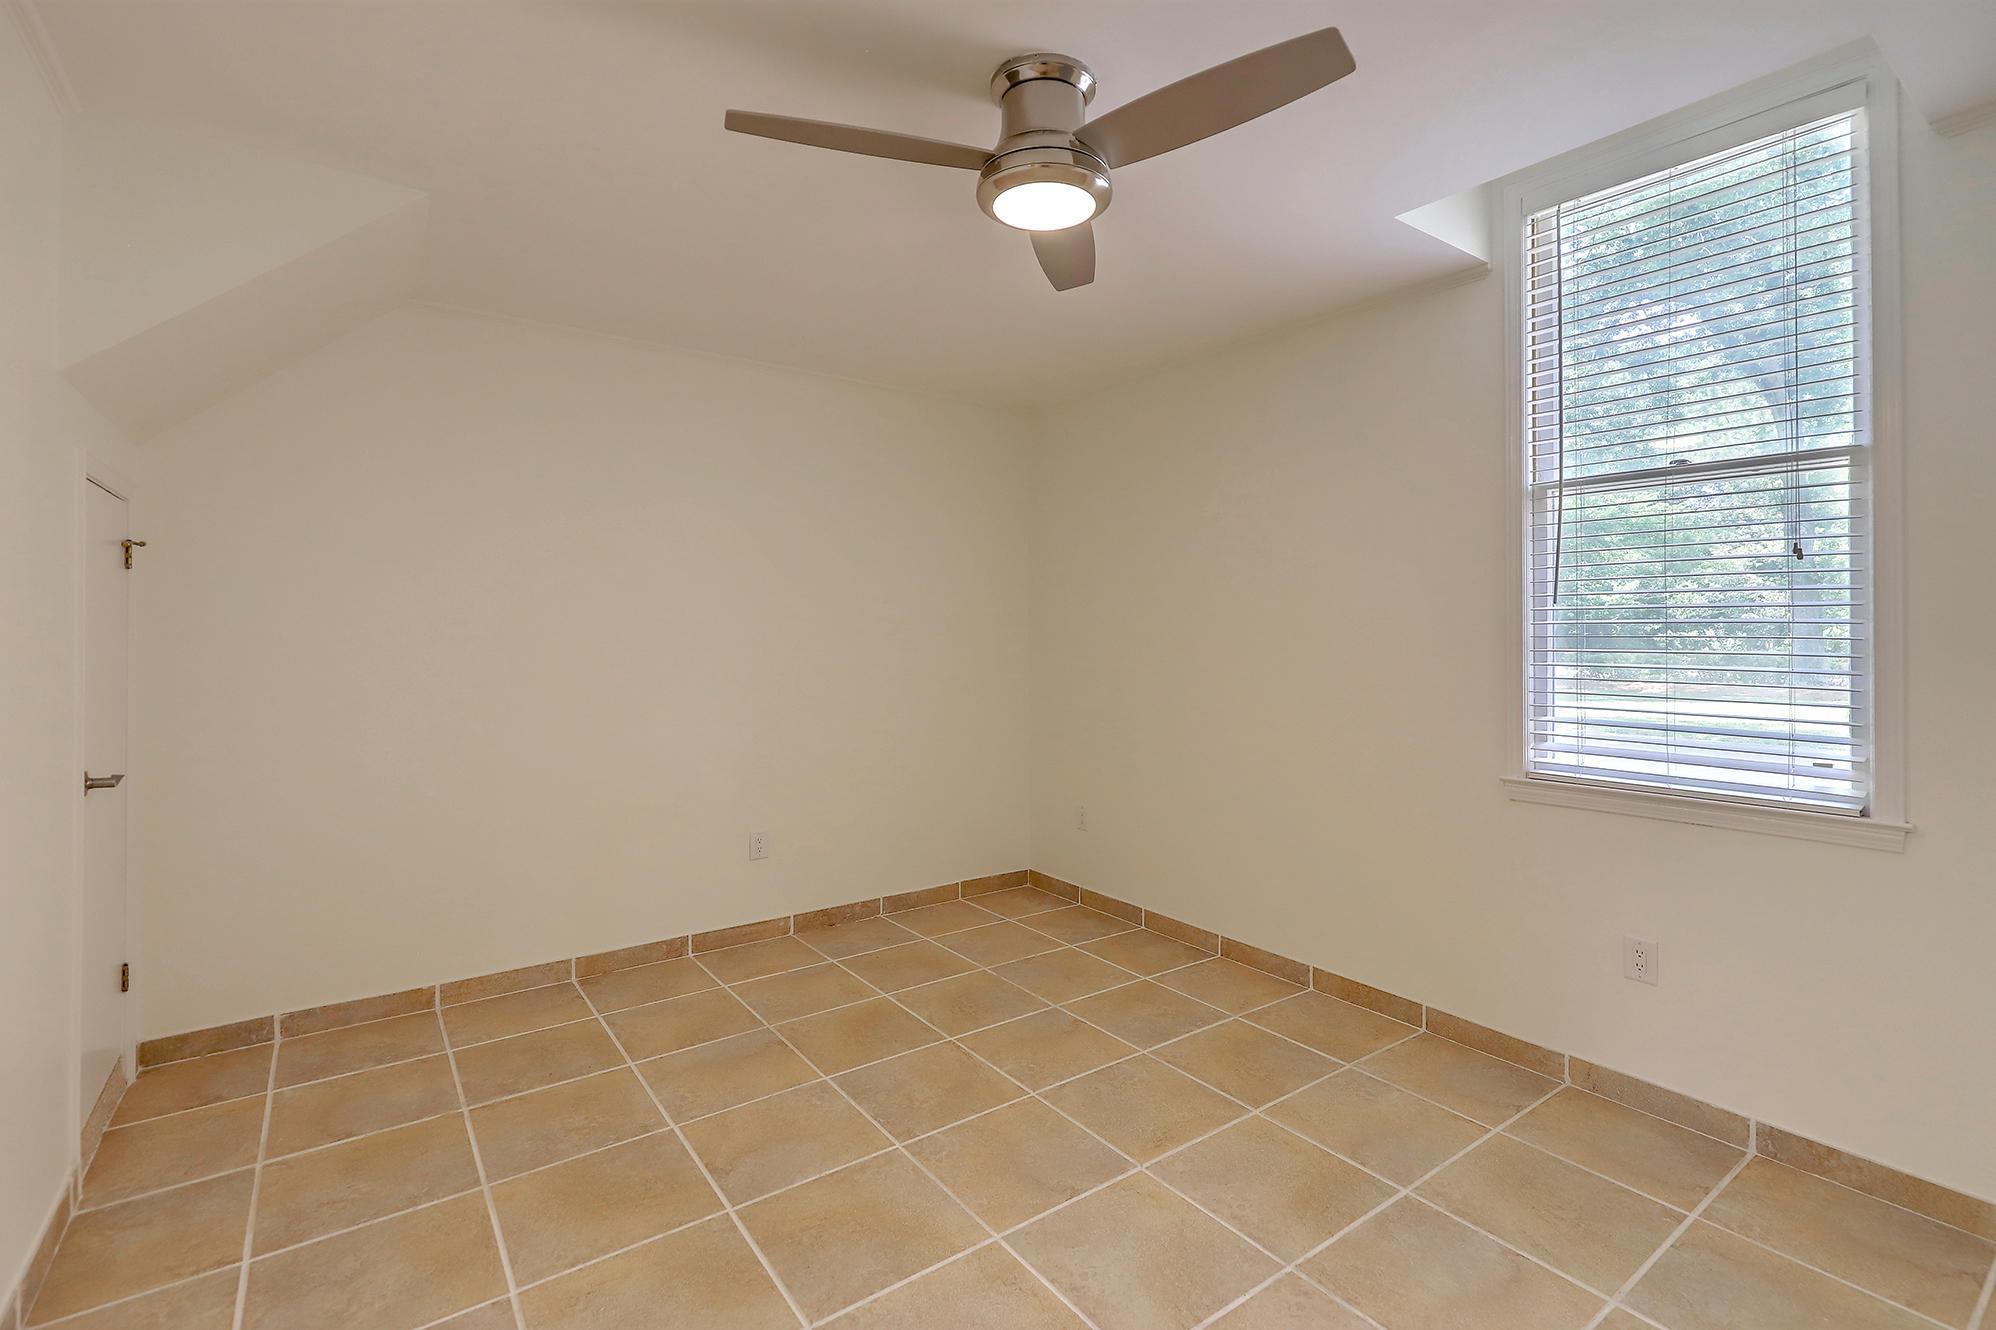 Edgewater Park Homes For Sale - 1413 Edsent, Charleston, SC - 30